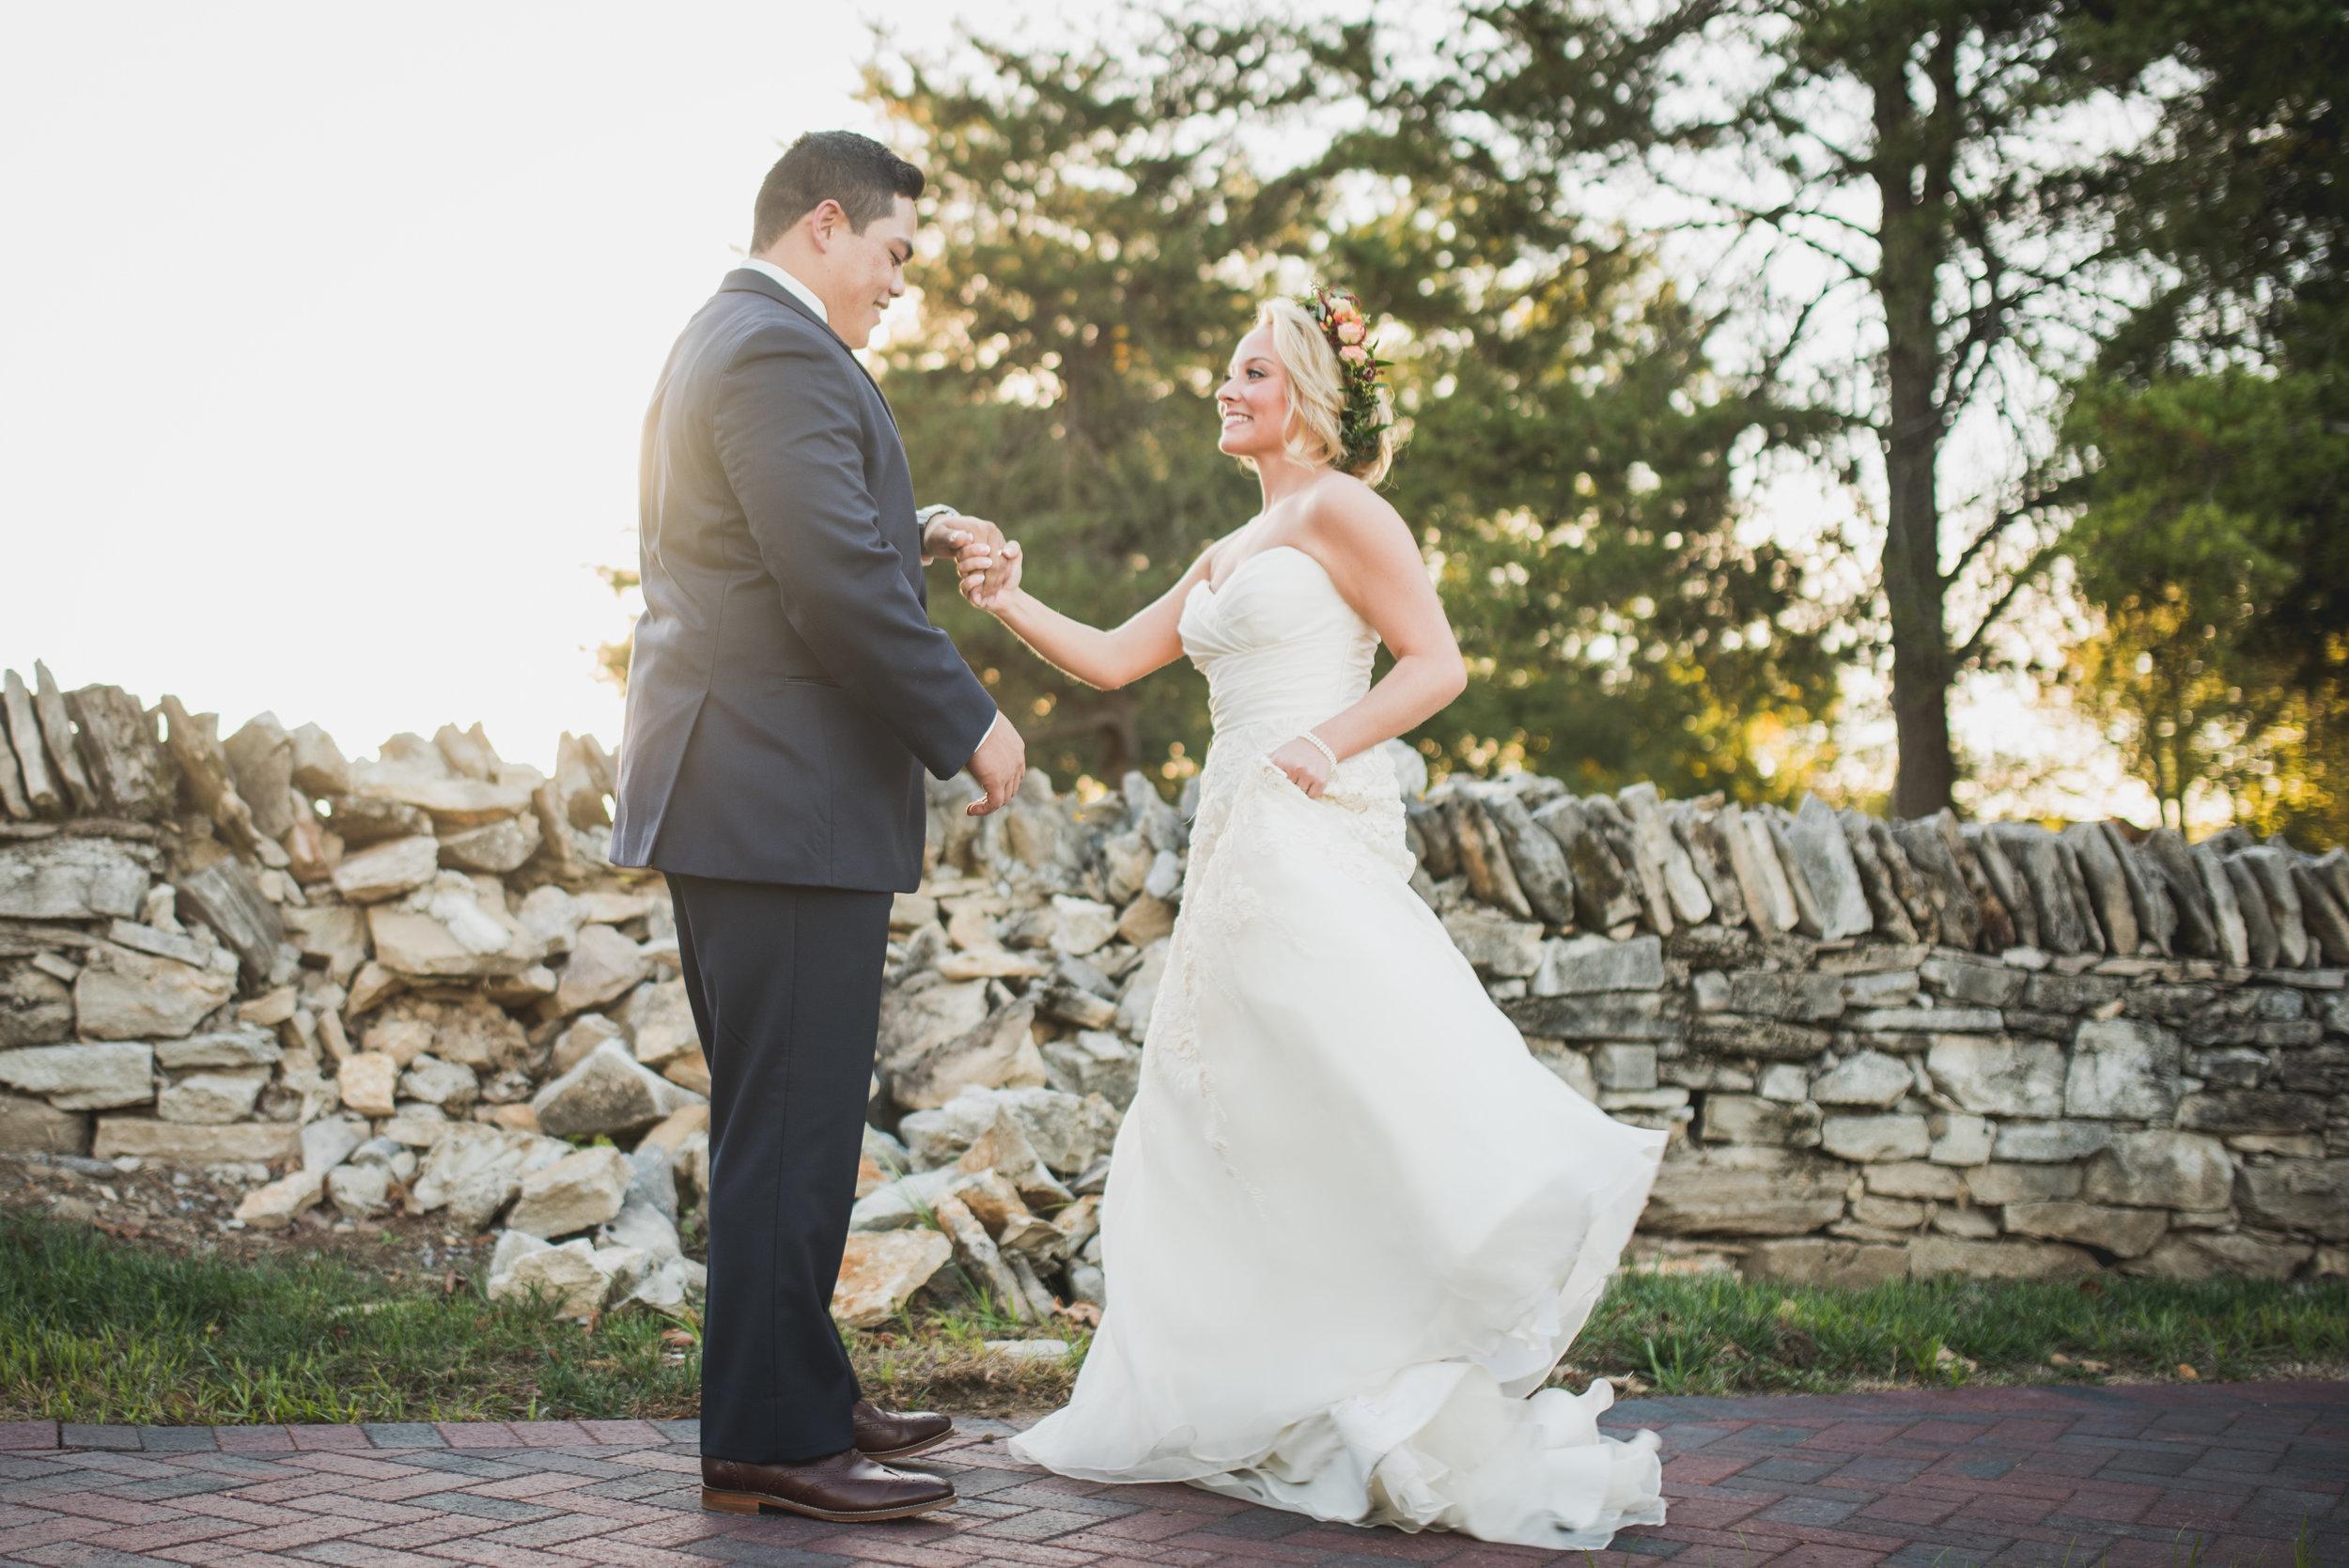 Nashville-wedding-photographers-CJ's-Off-The-Square-45.JPG